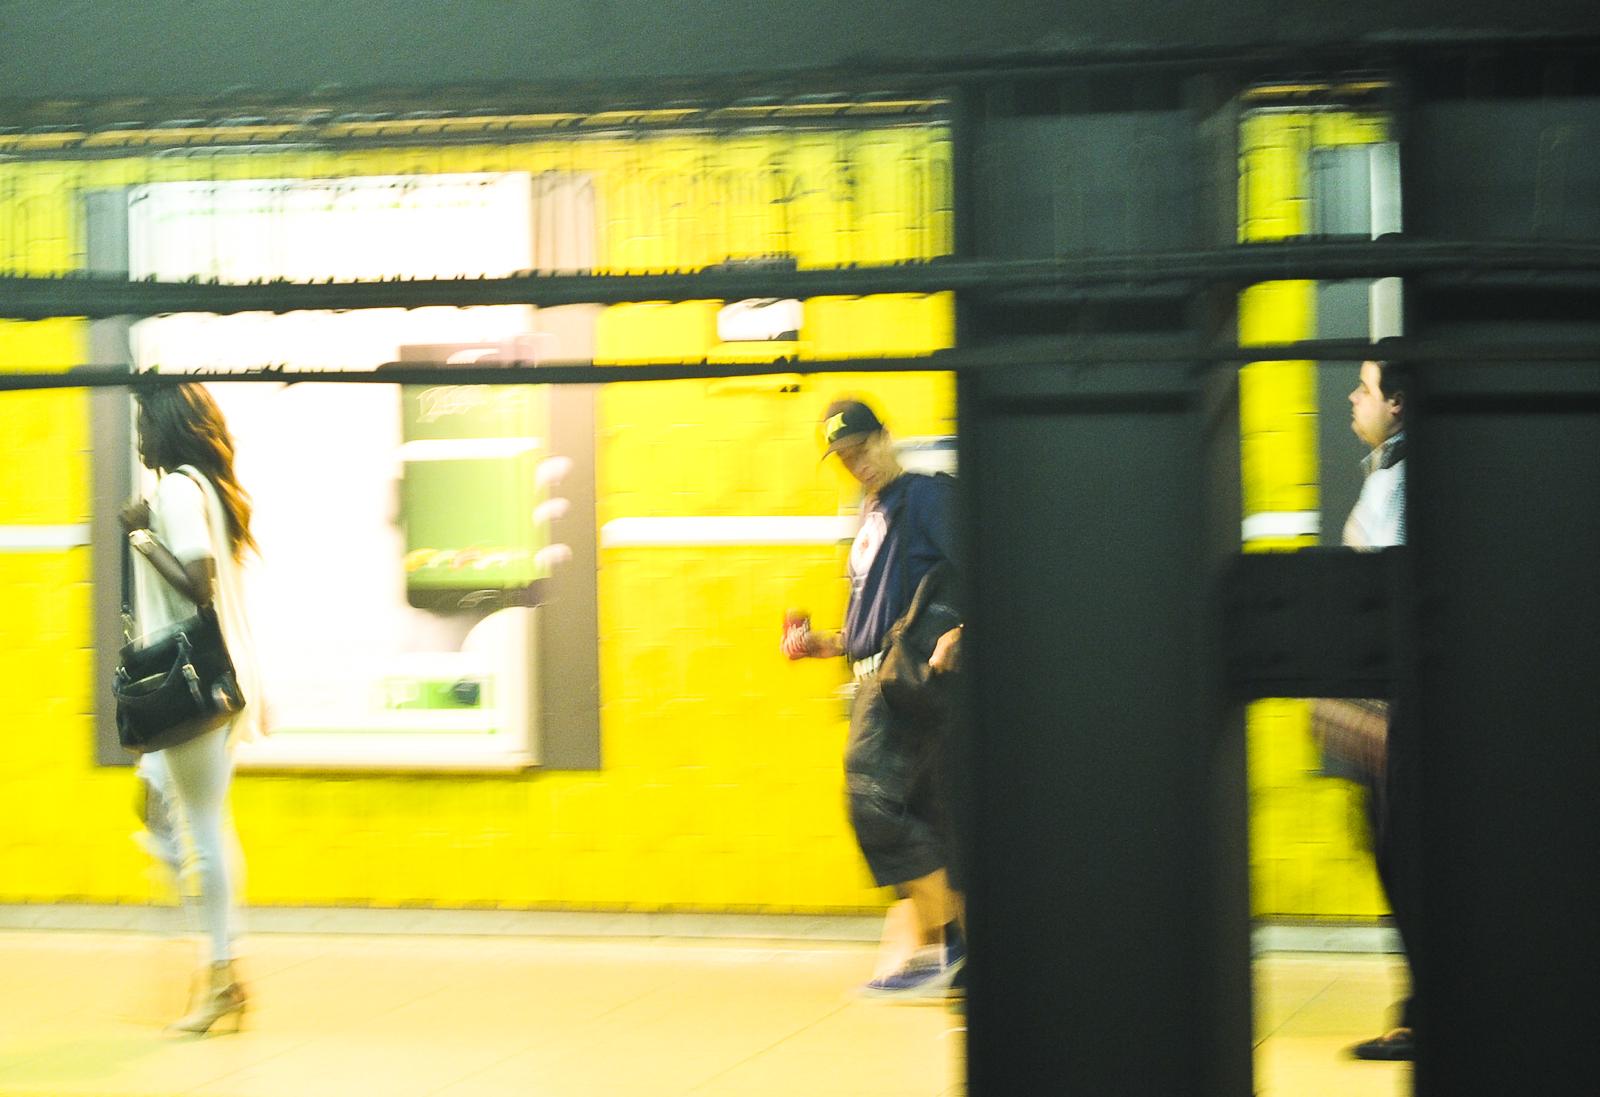 In Motion - Toronto Subway